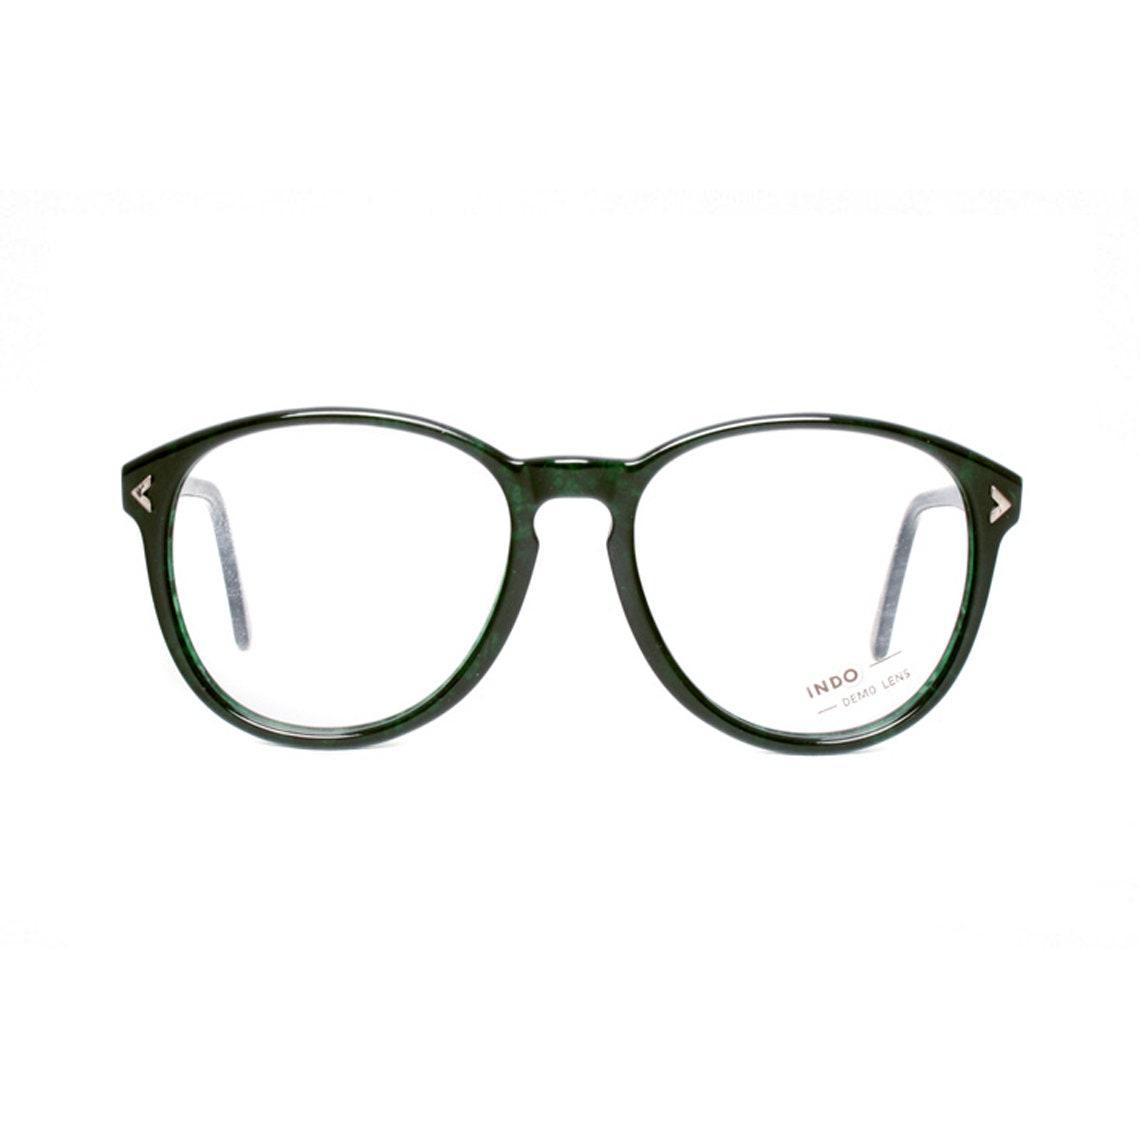 c68e1c68a3 Vintage round glasses frames green eyeglasses 1980s